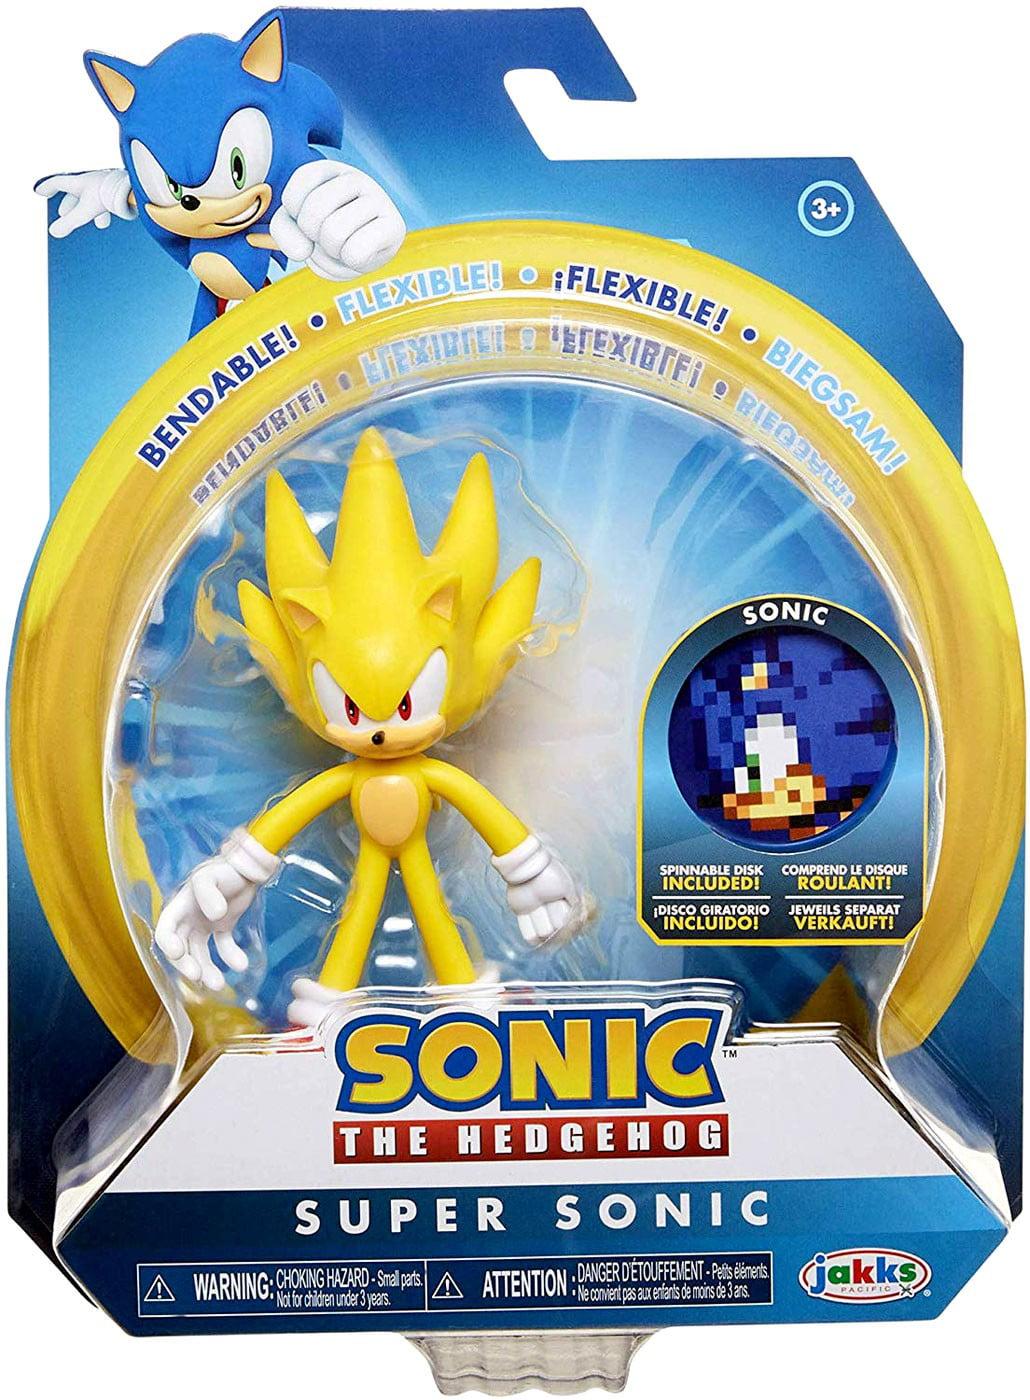 Sonic The Hedgehog Basic Super Sonic Action Figure Walmart Com Walmart Com